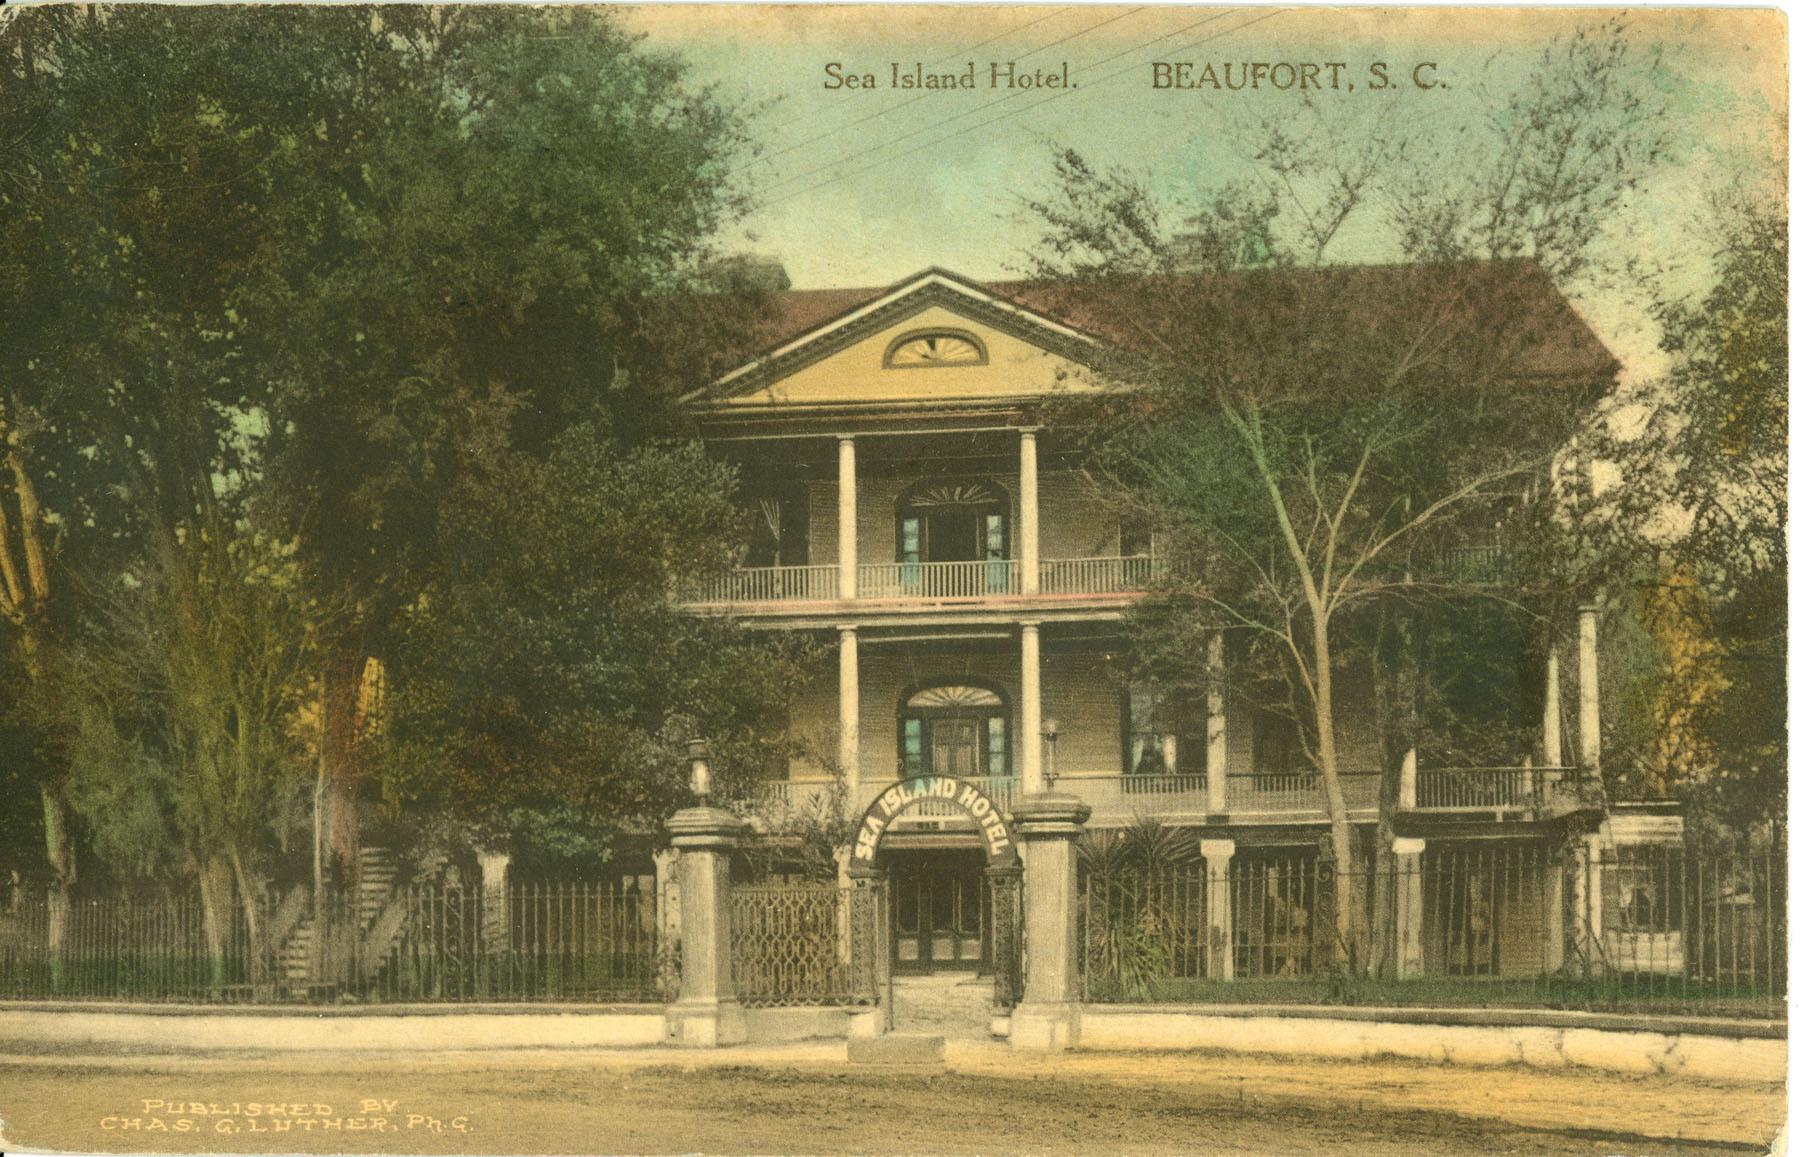 Sea Island Hotel.  Beaufort, South Carolina